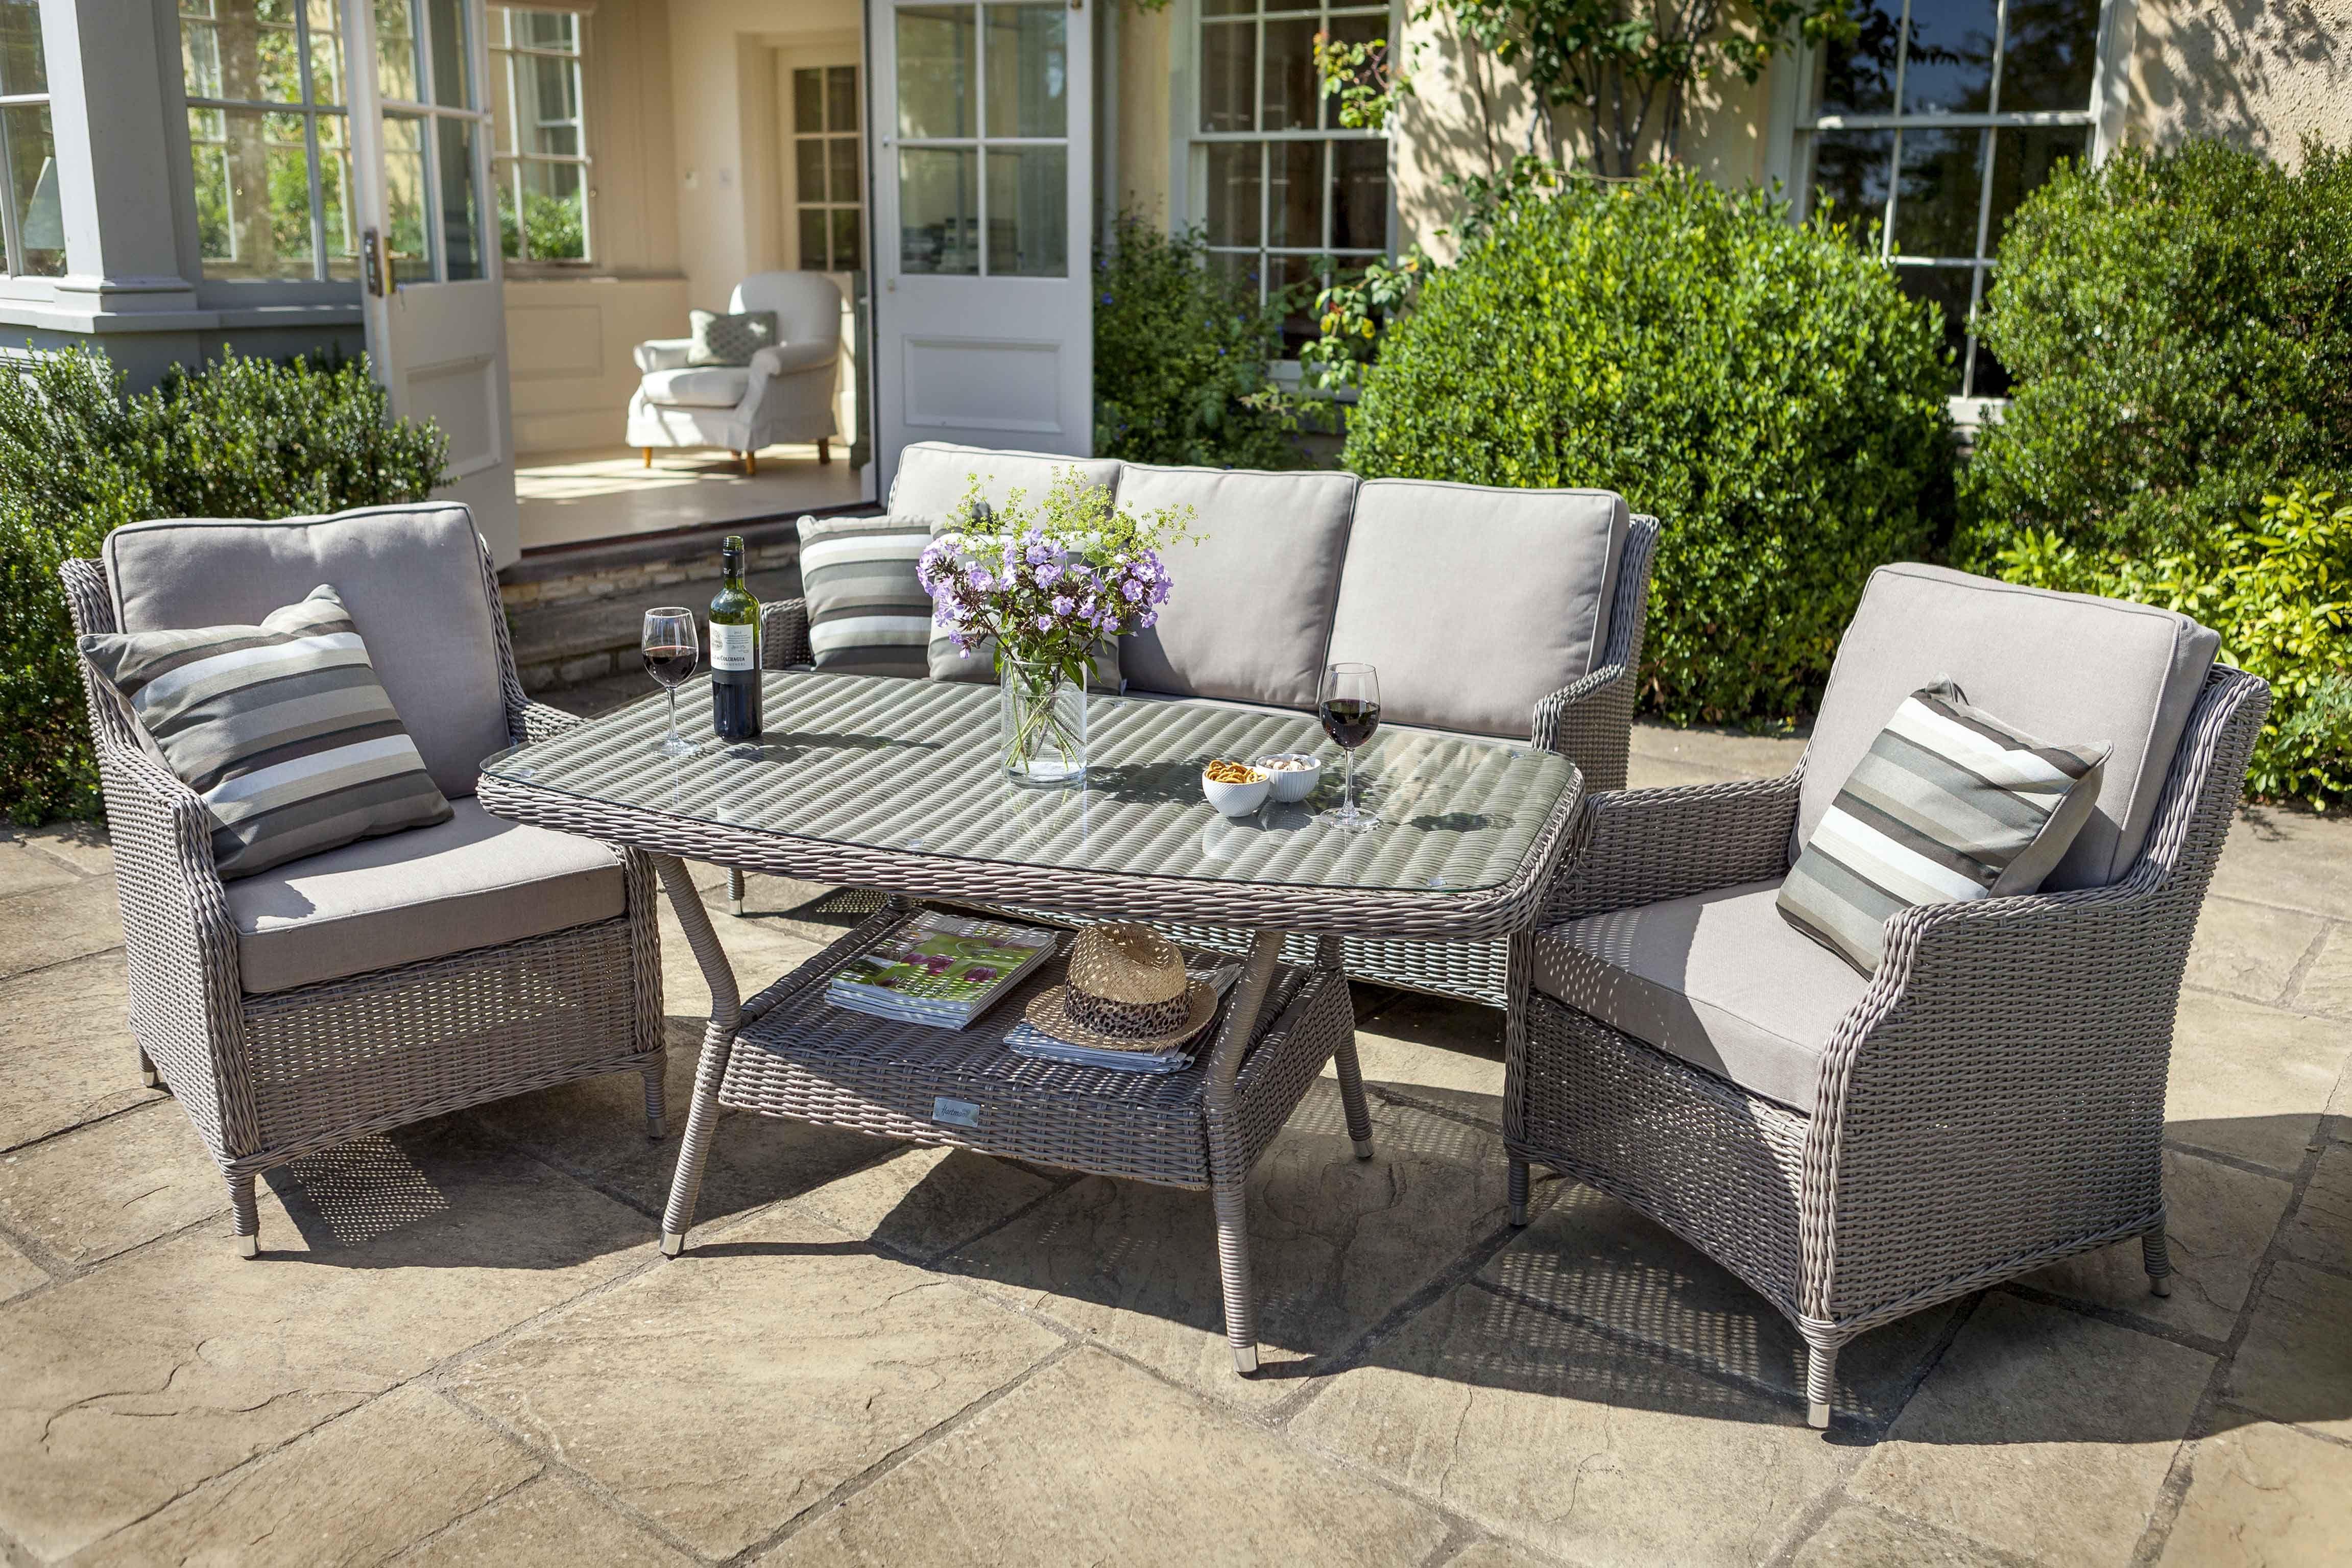 Hartford Casual Lounge Set | Hartman Resin Weave Garden Furniture ...